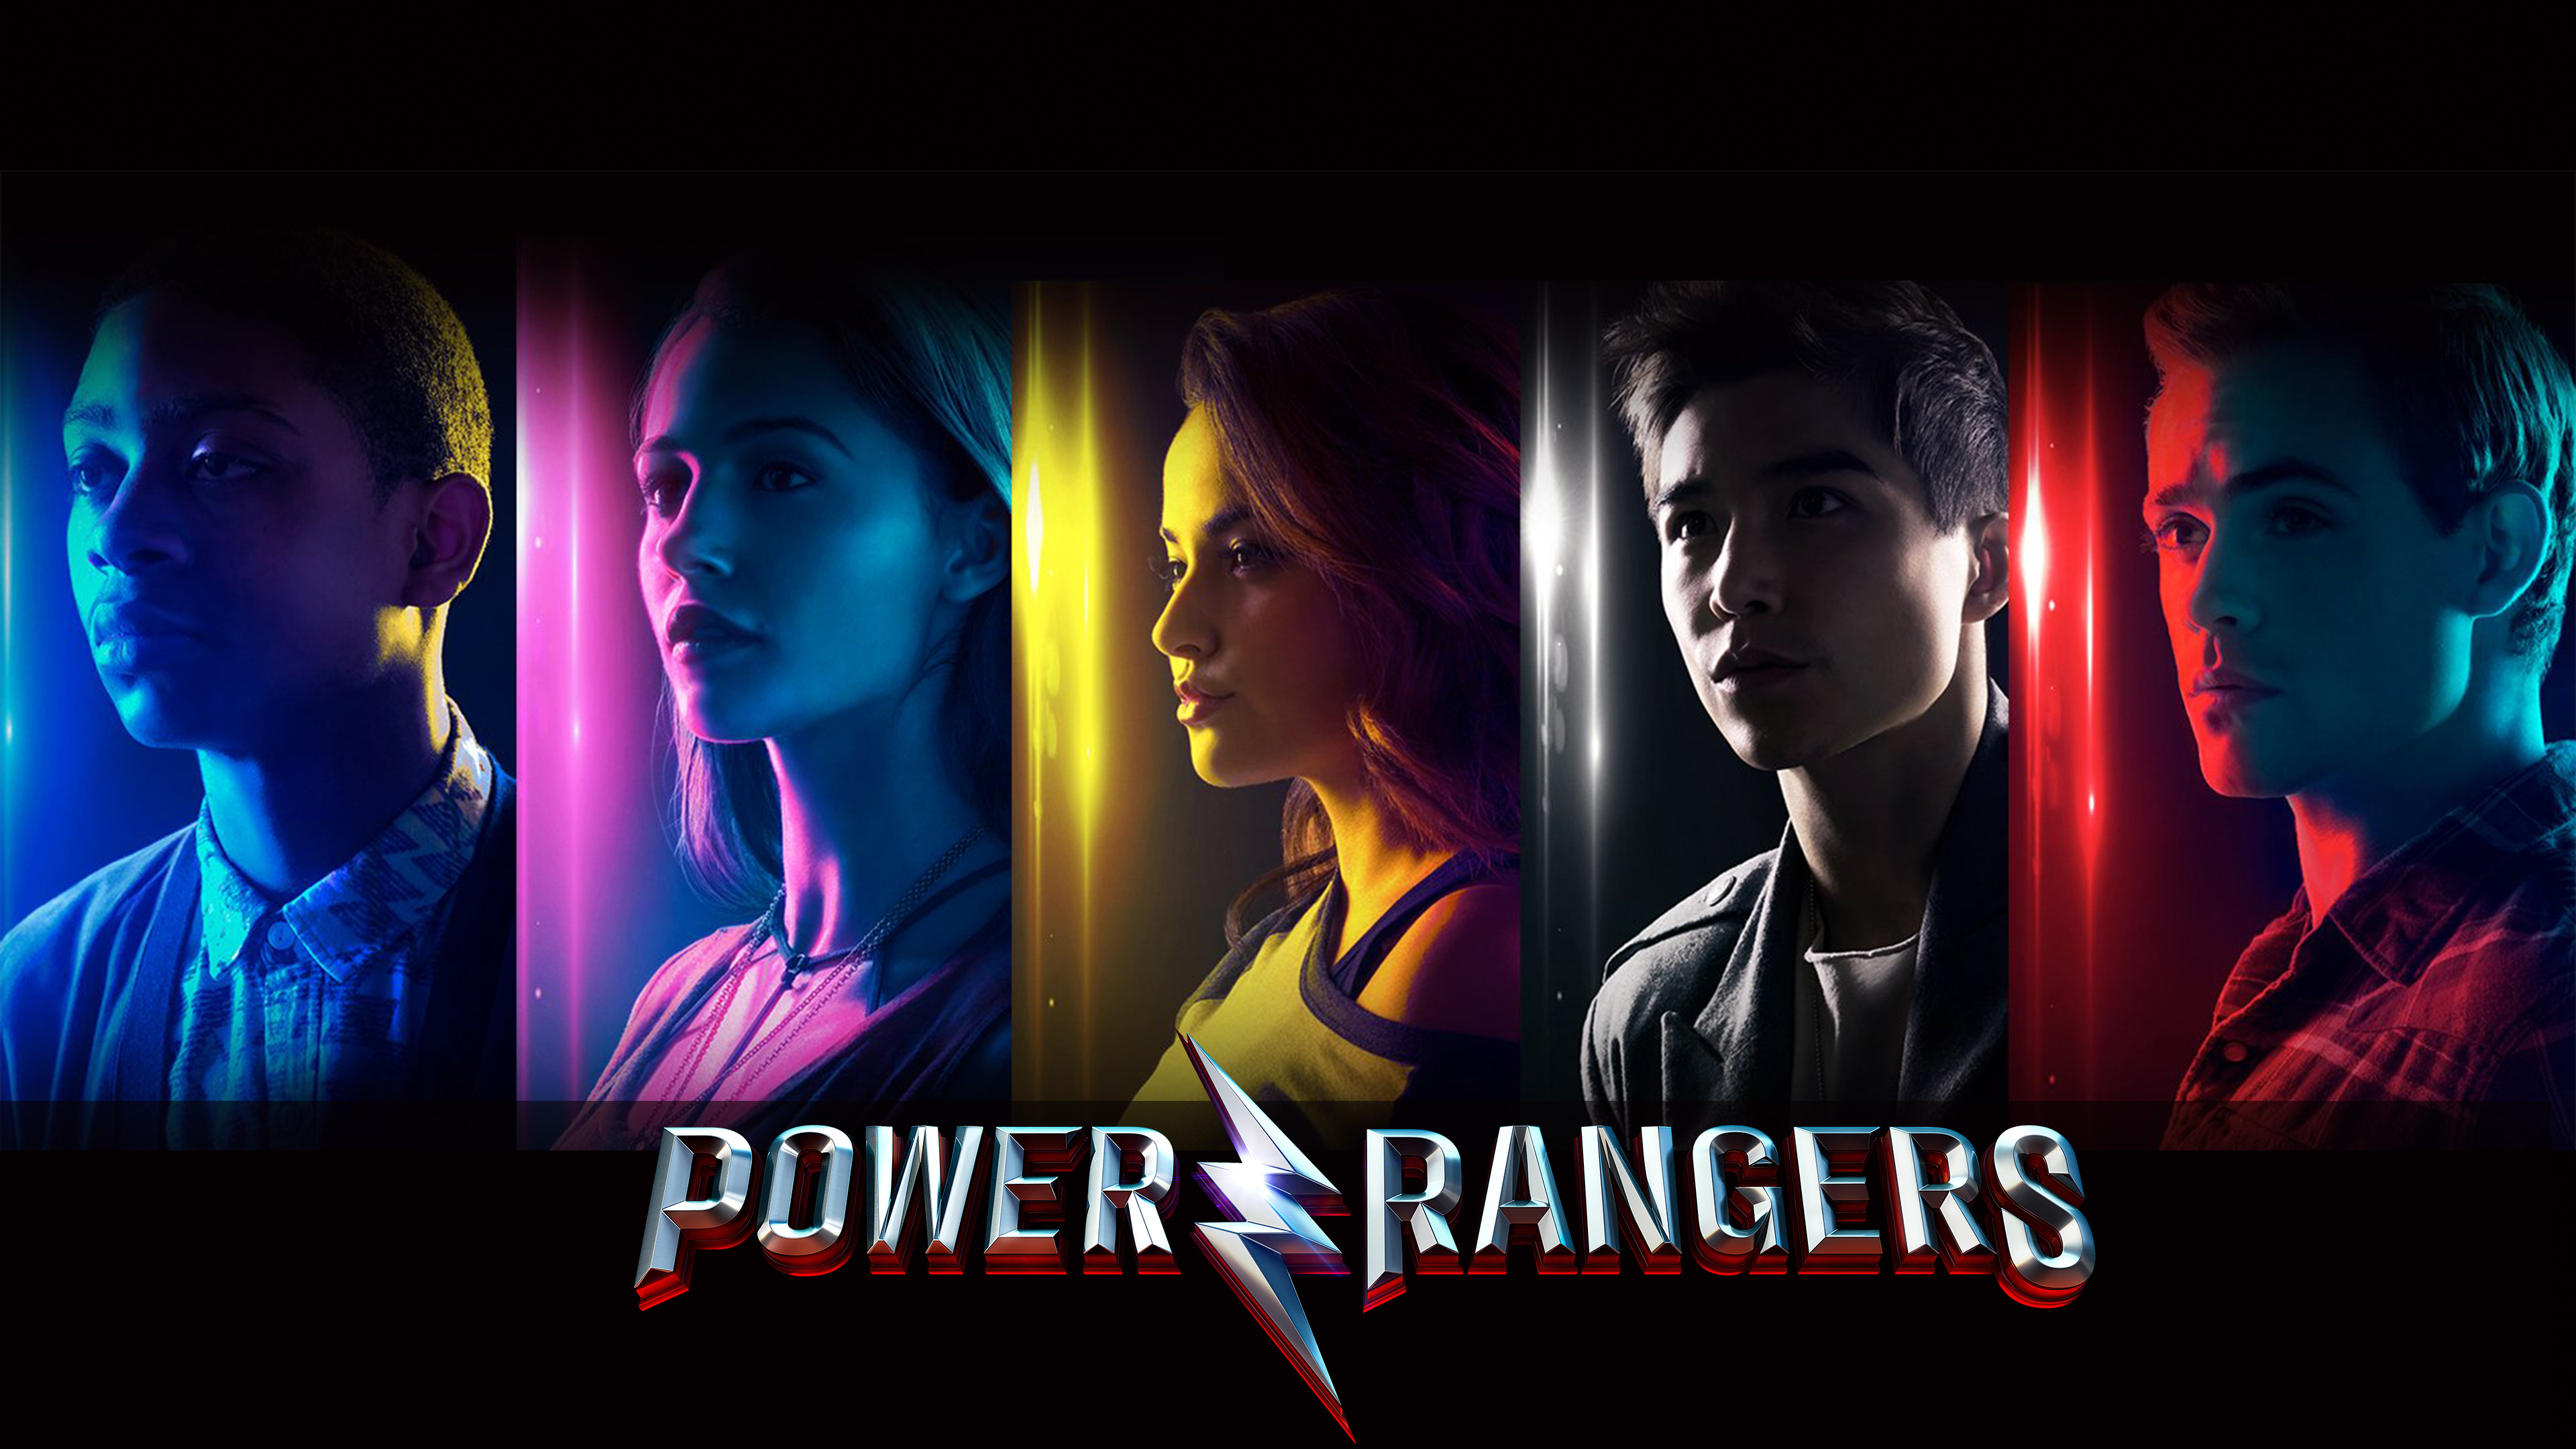 Fondo de pantalla de Poster de Power Rangers Imágenes